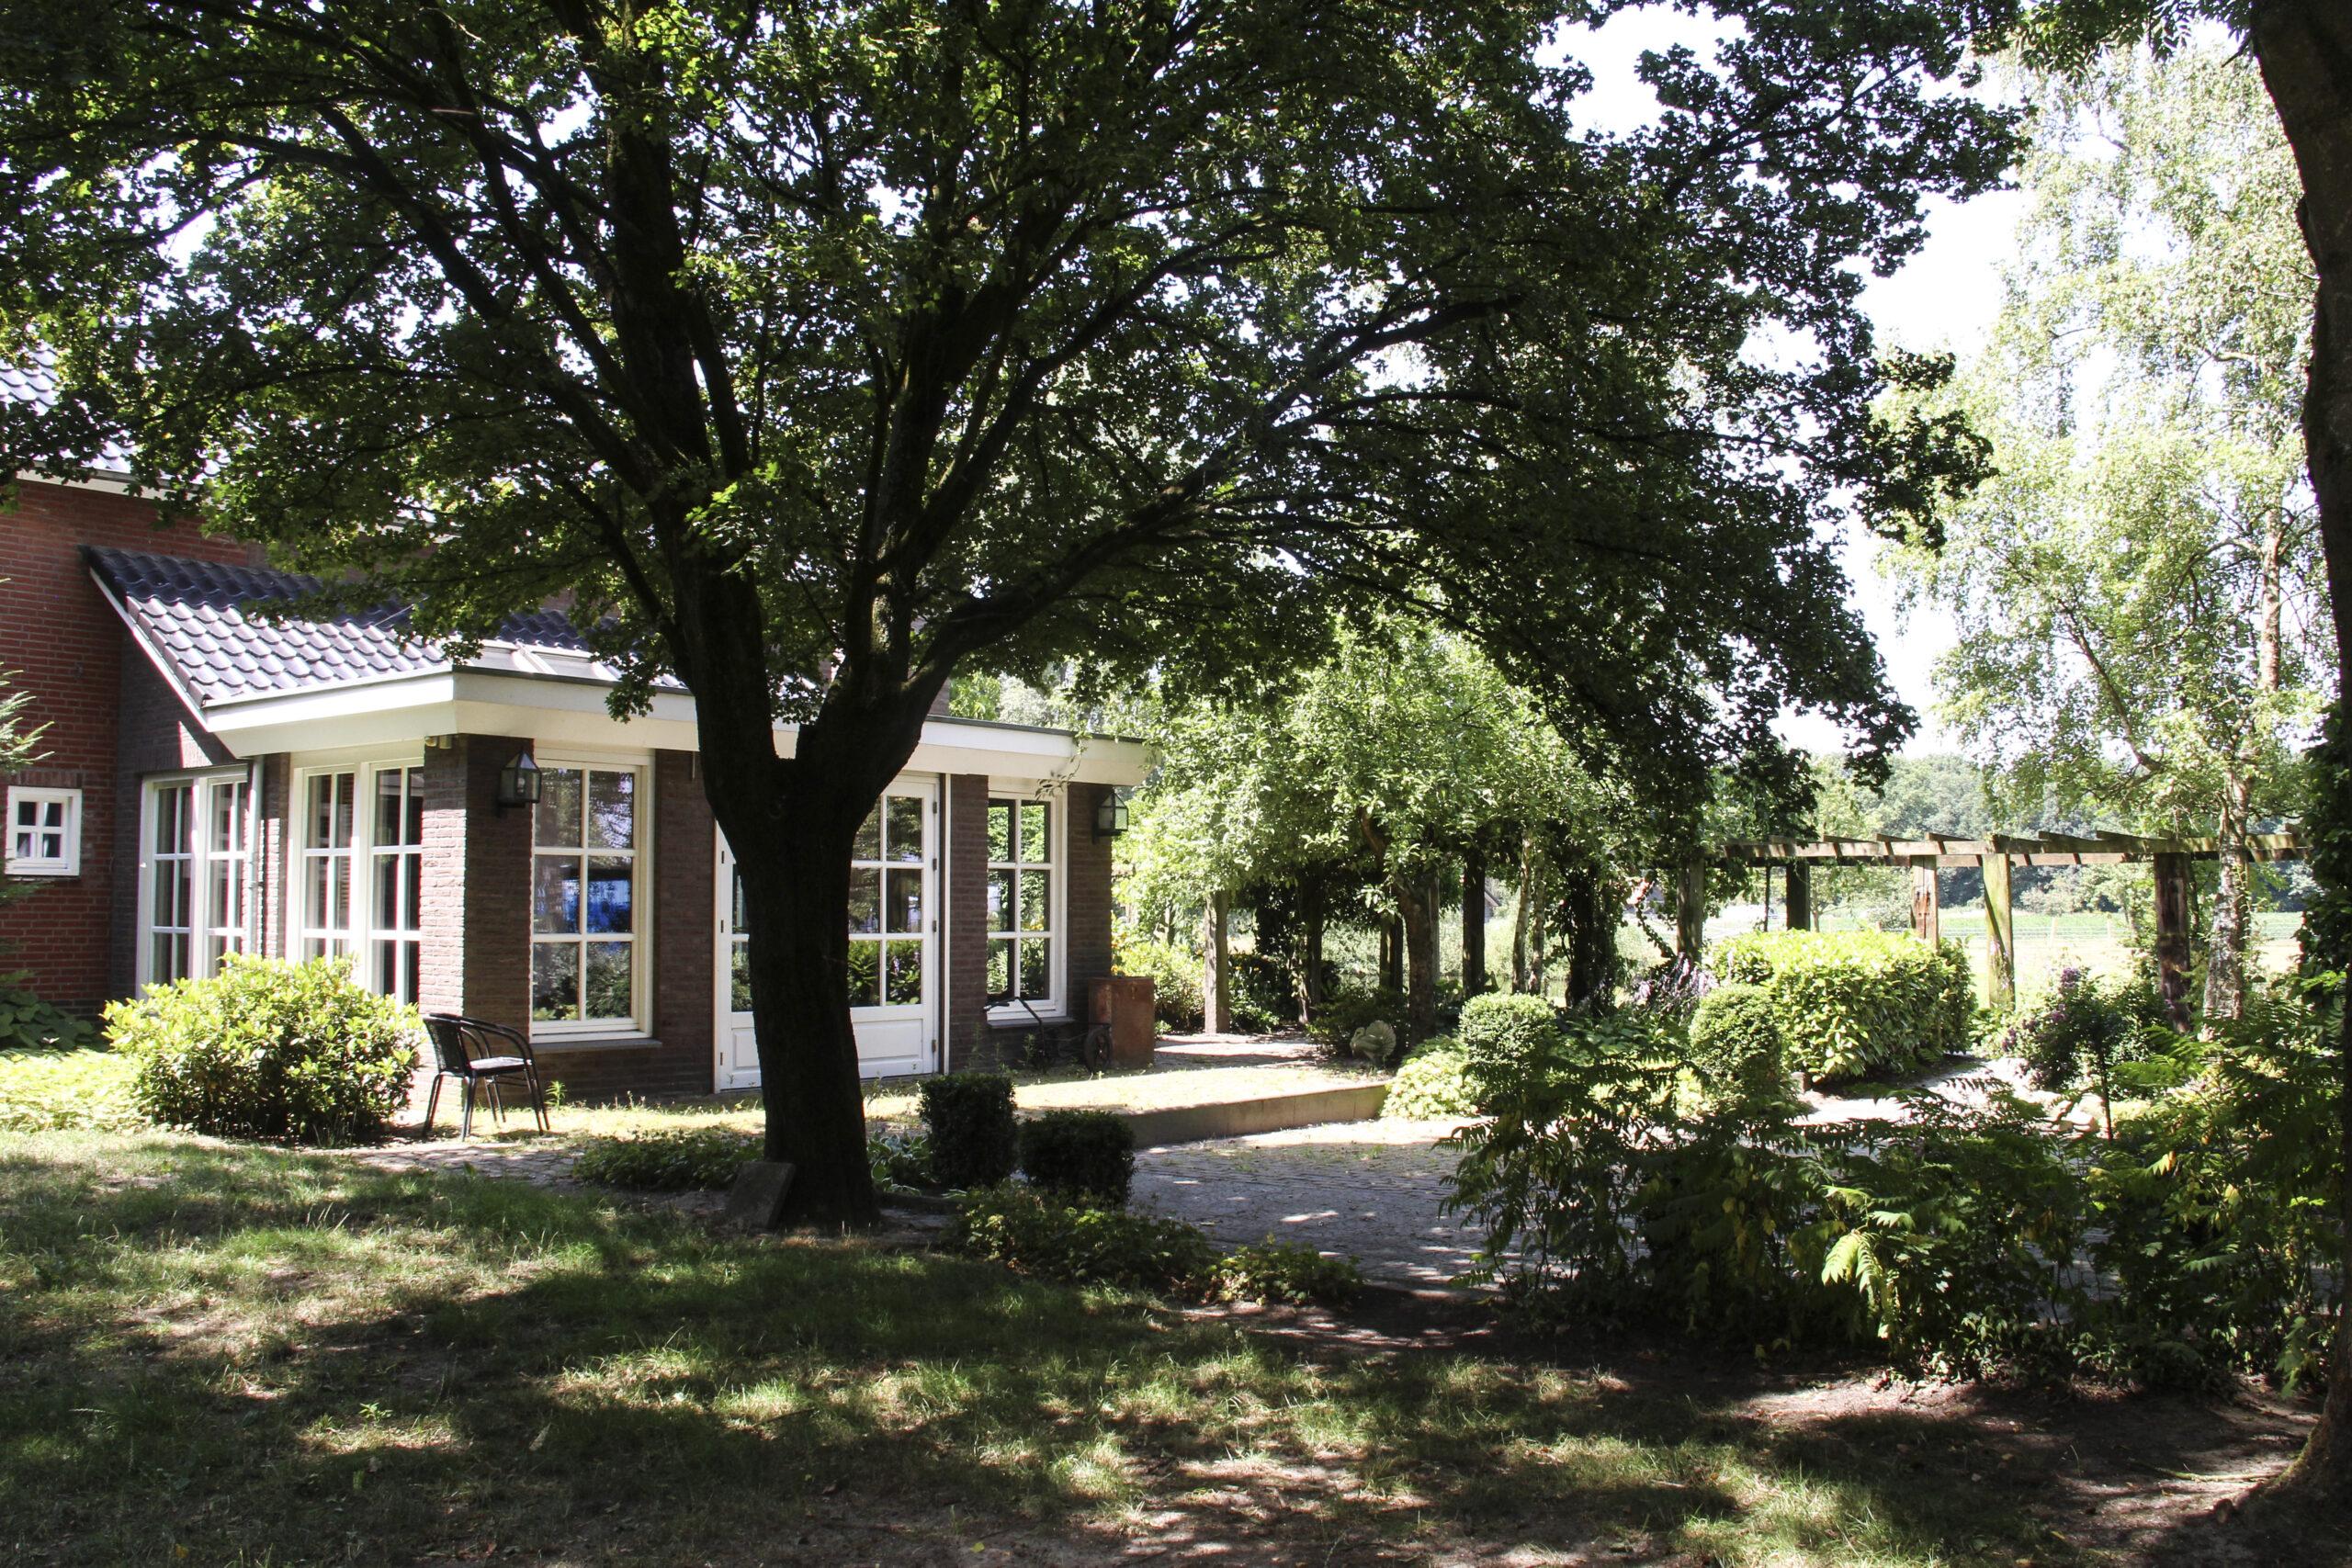 Landhuis de Heilboem